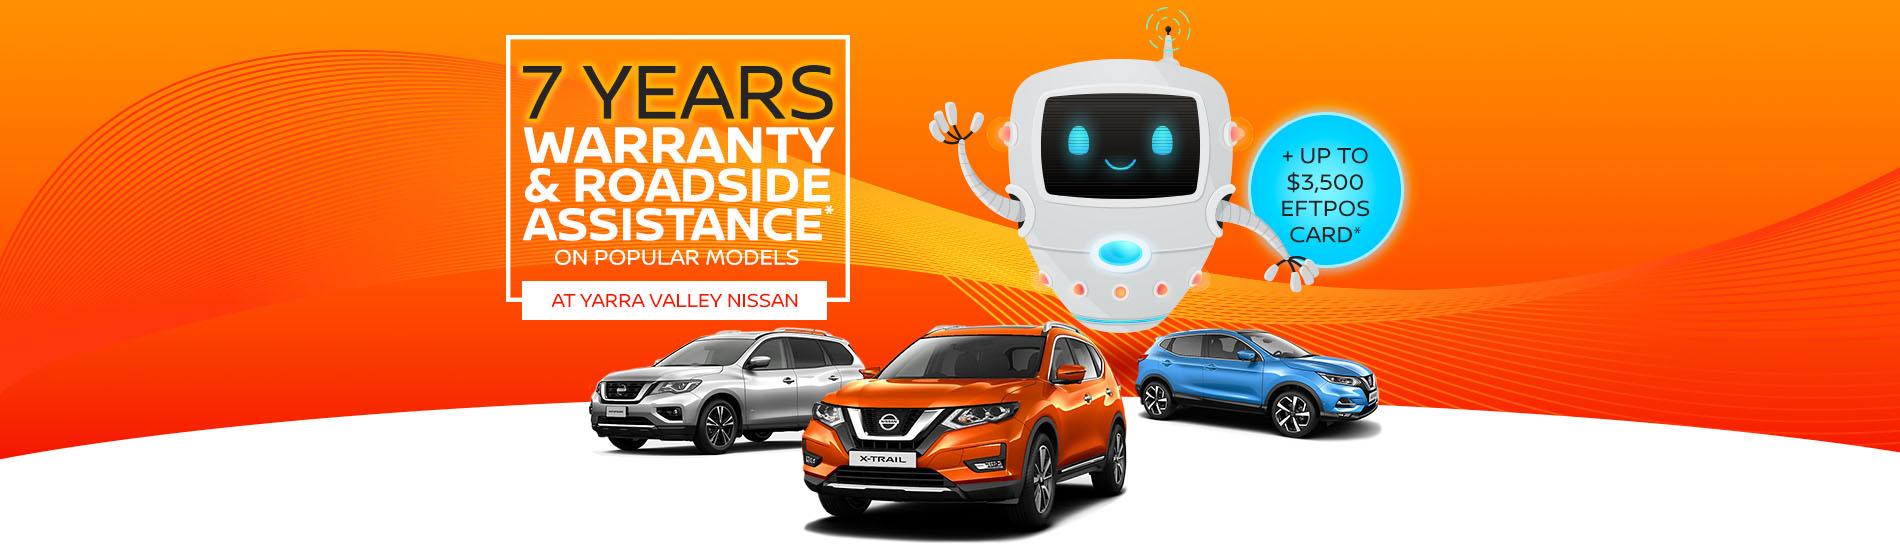 Yarra Valley Nissan - 7 Year Warranty